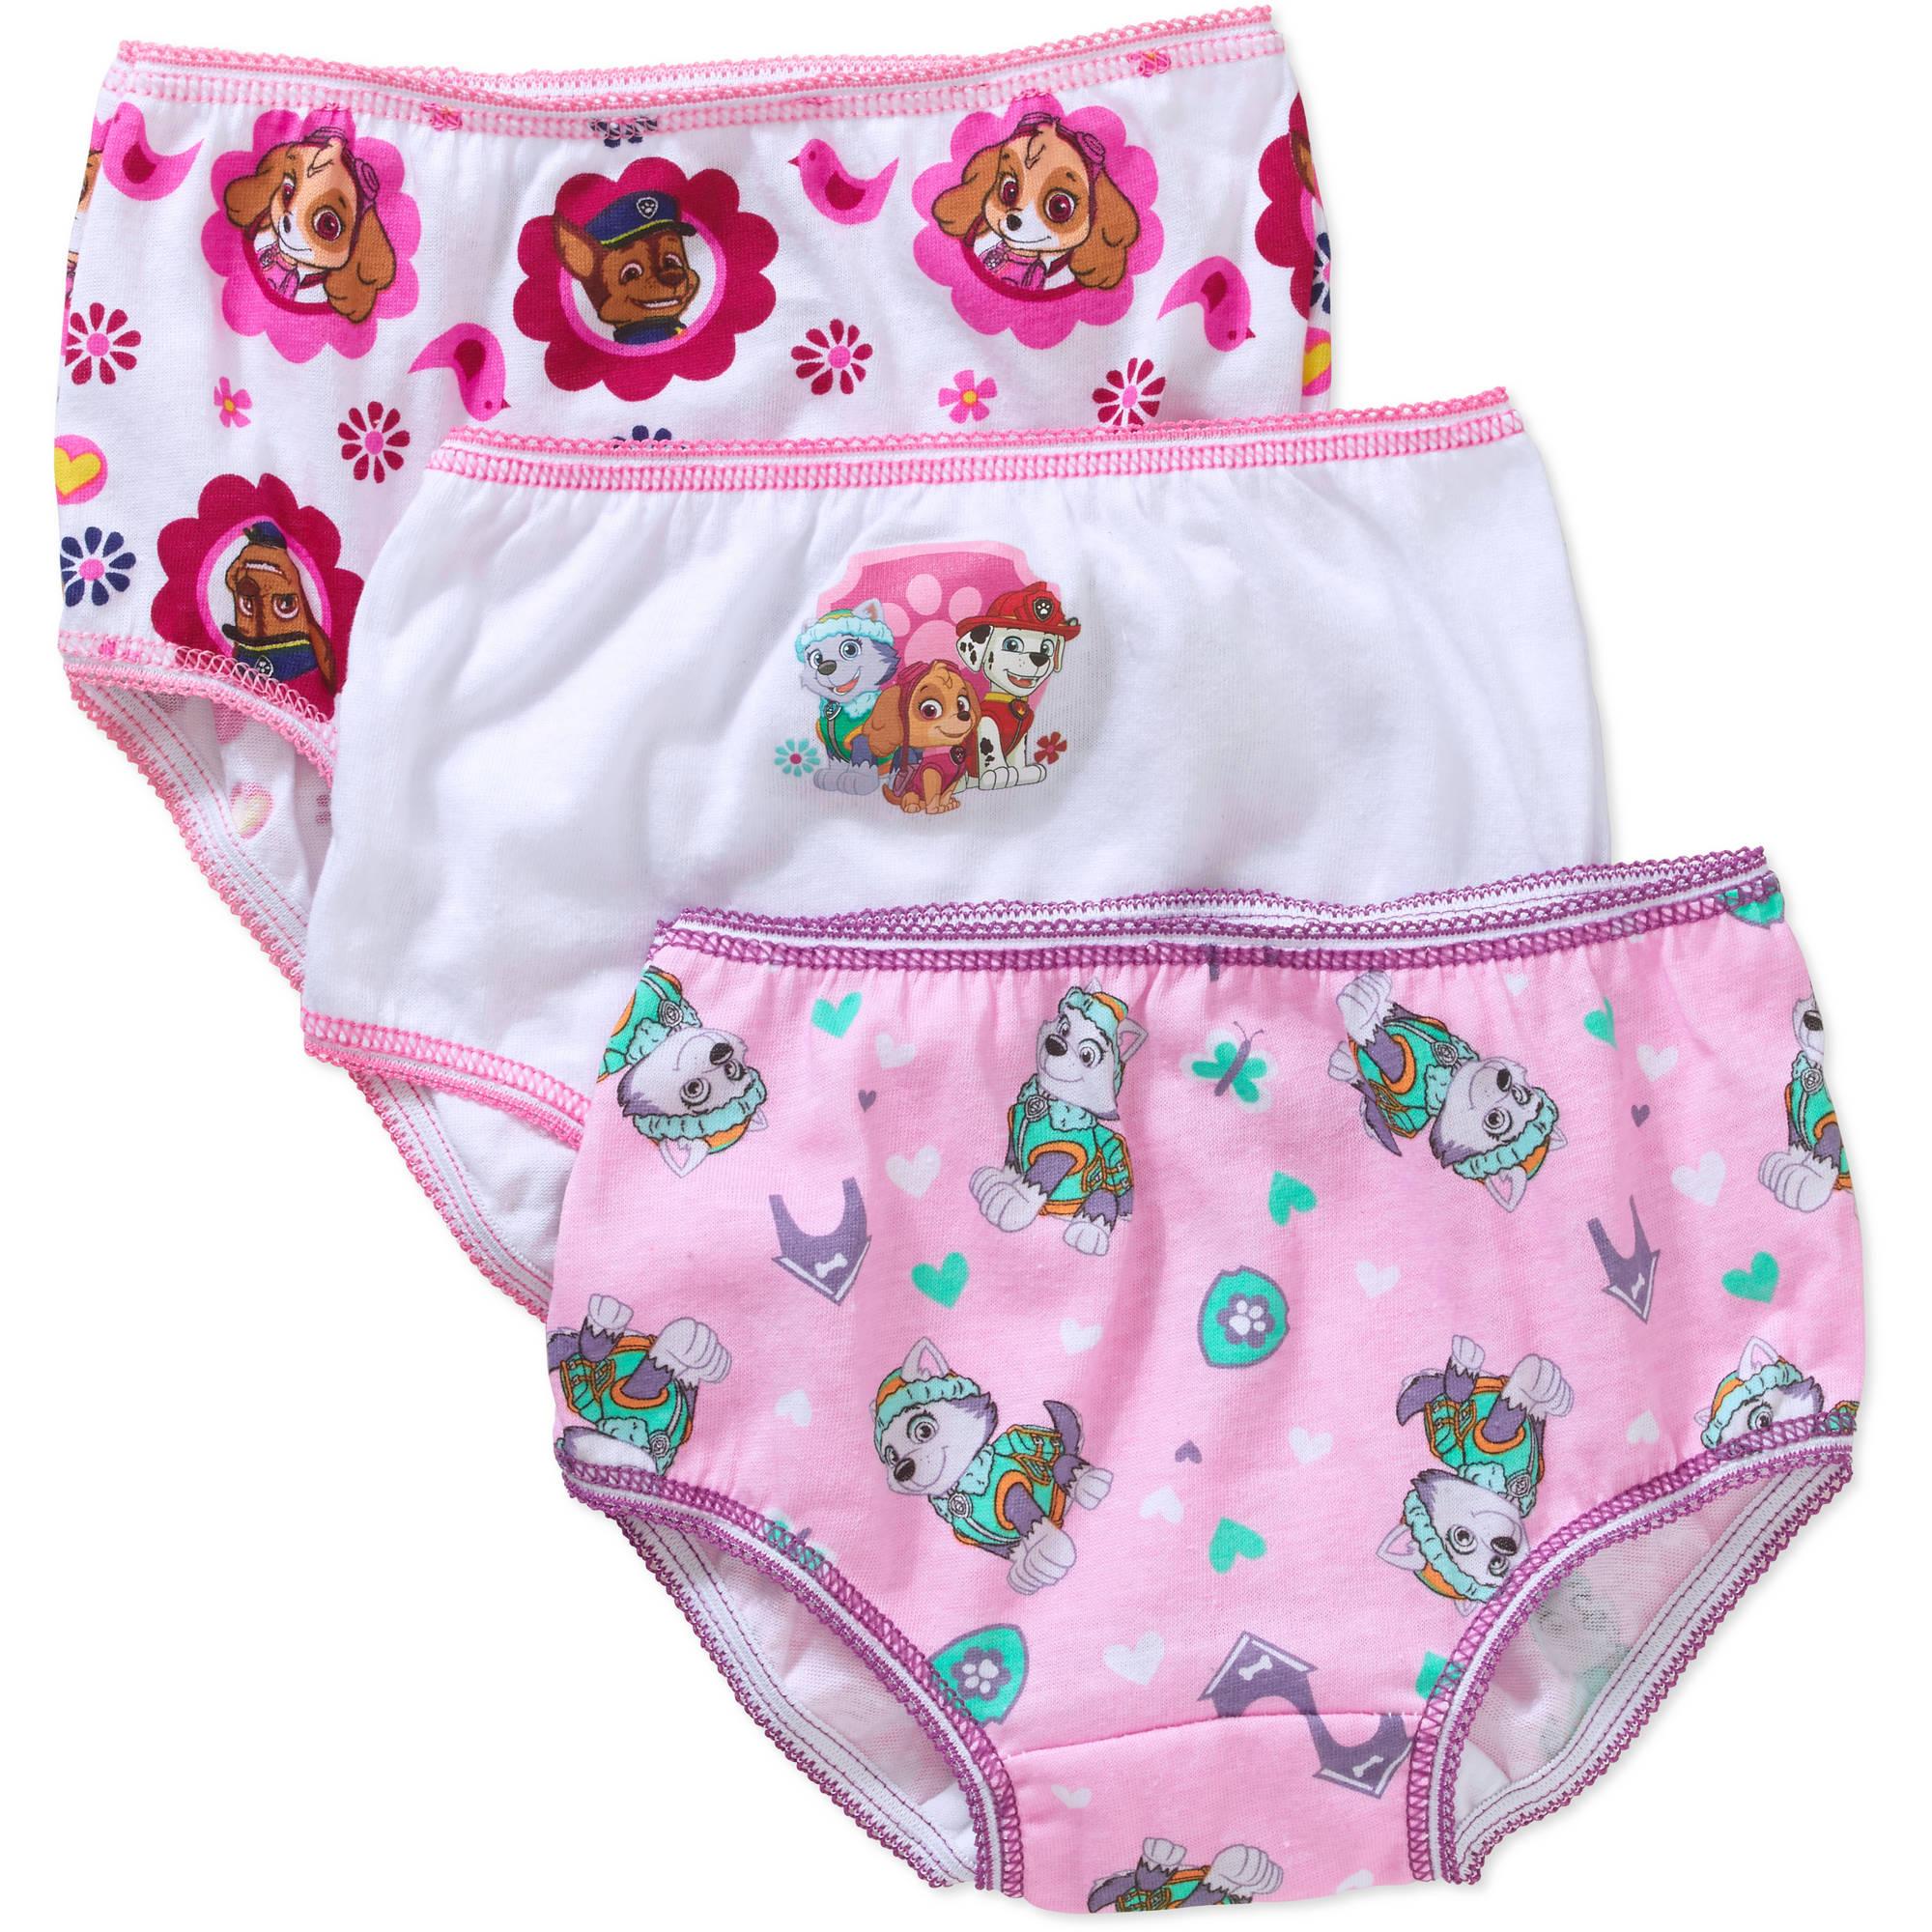 Nickelodeon Paw Patrol Toddler Girls Underwear, 3-Pack